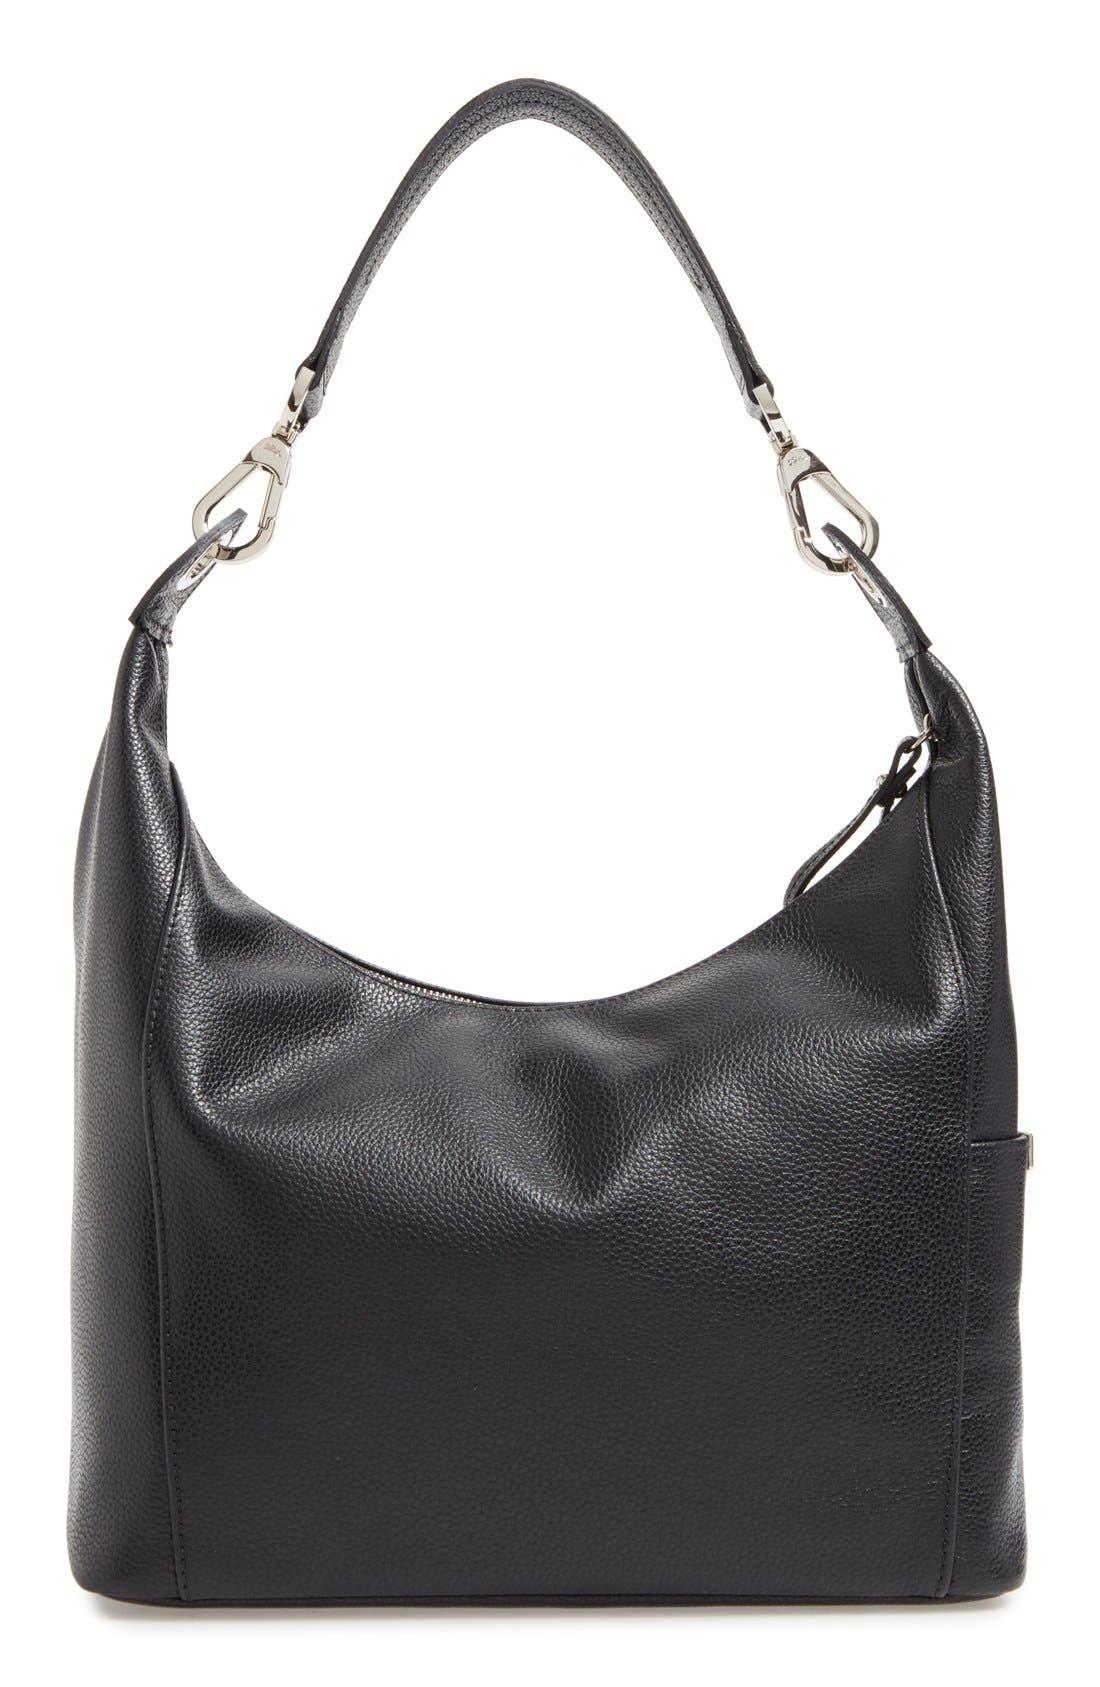 'Le Foulonne' Leather Hobo Bag,                             Alternate thumbnail 3, color,                             BLACK